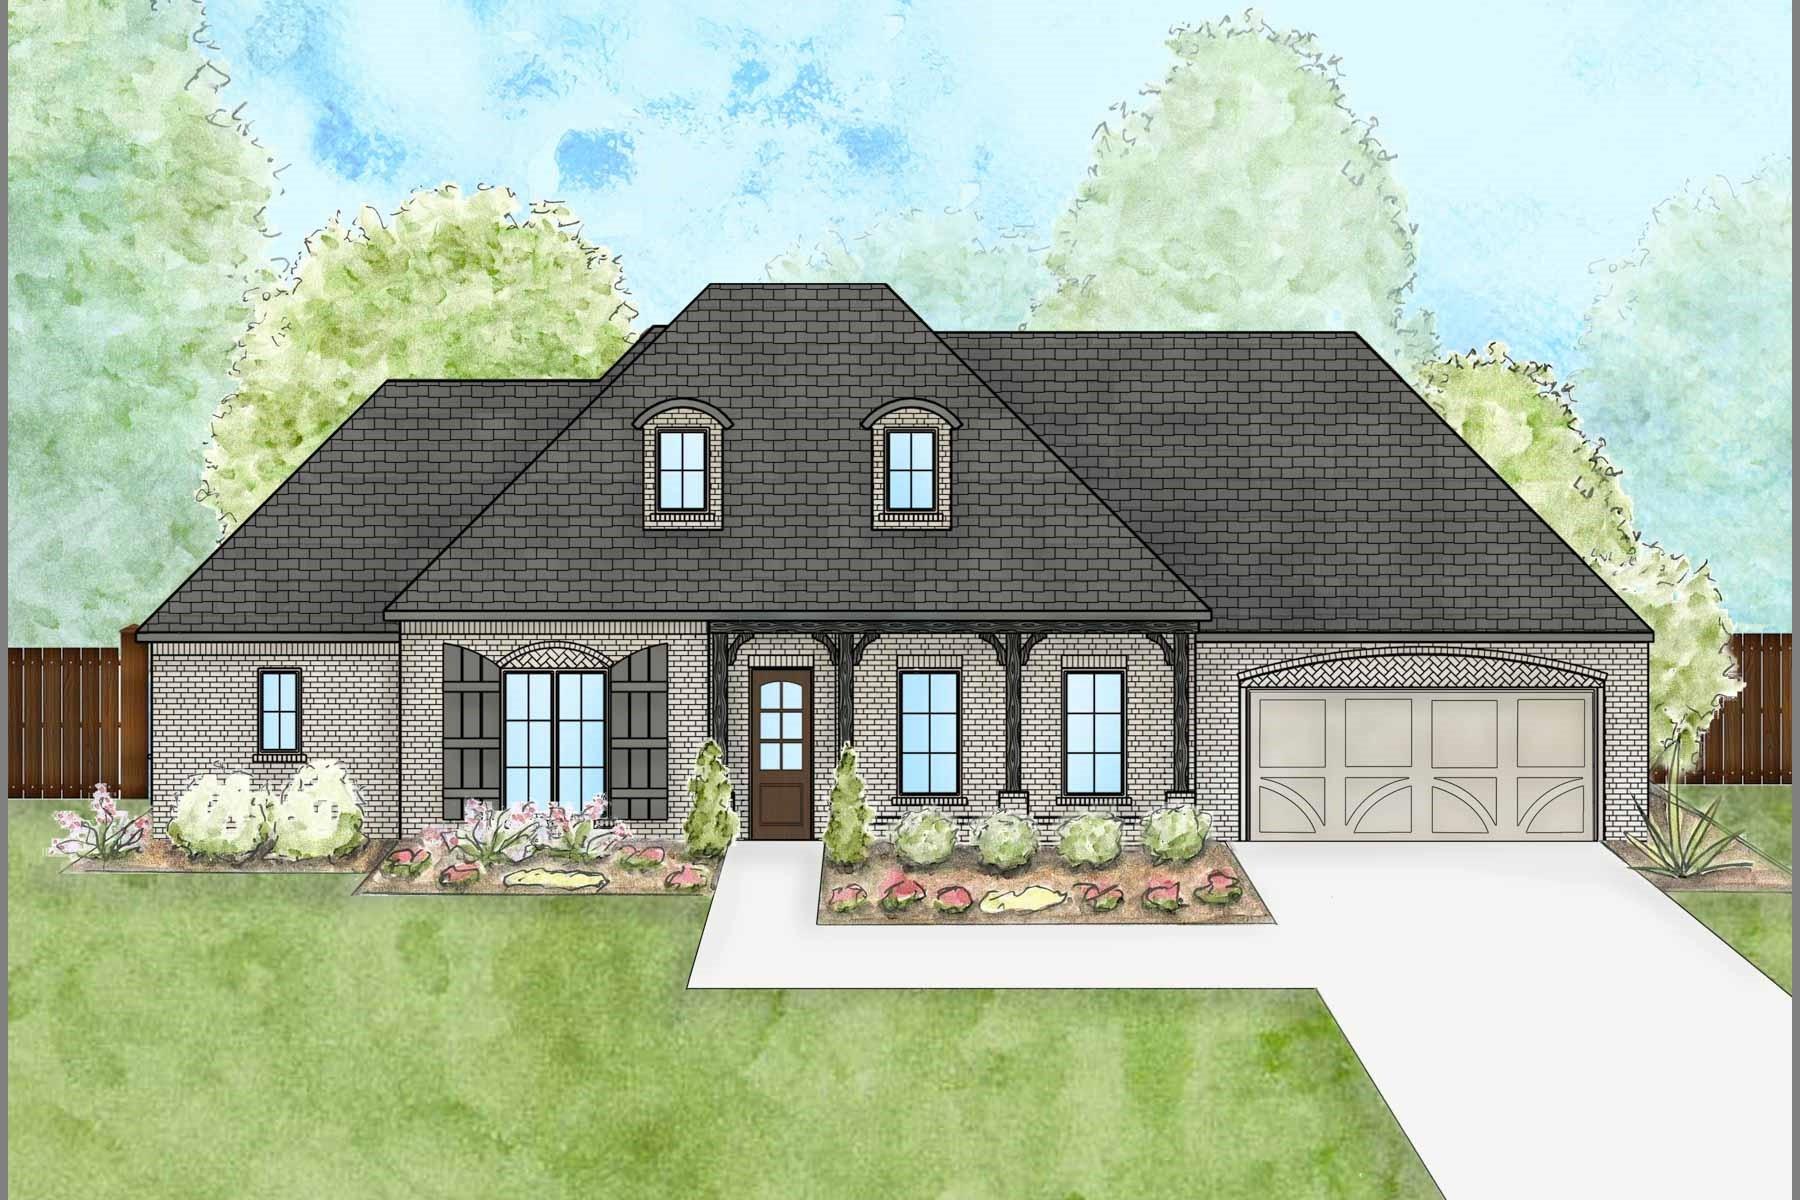 Single Family Home for Sale at La Cantera at Team Ranch Traditional 5300 Pradera Ct Benbrook, Texas, 76126 United States